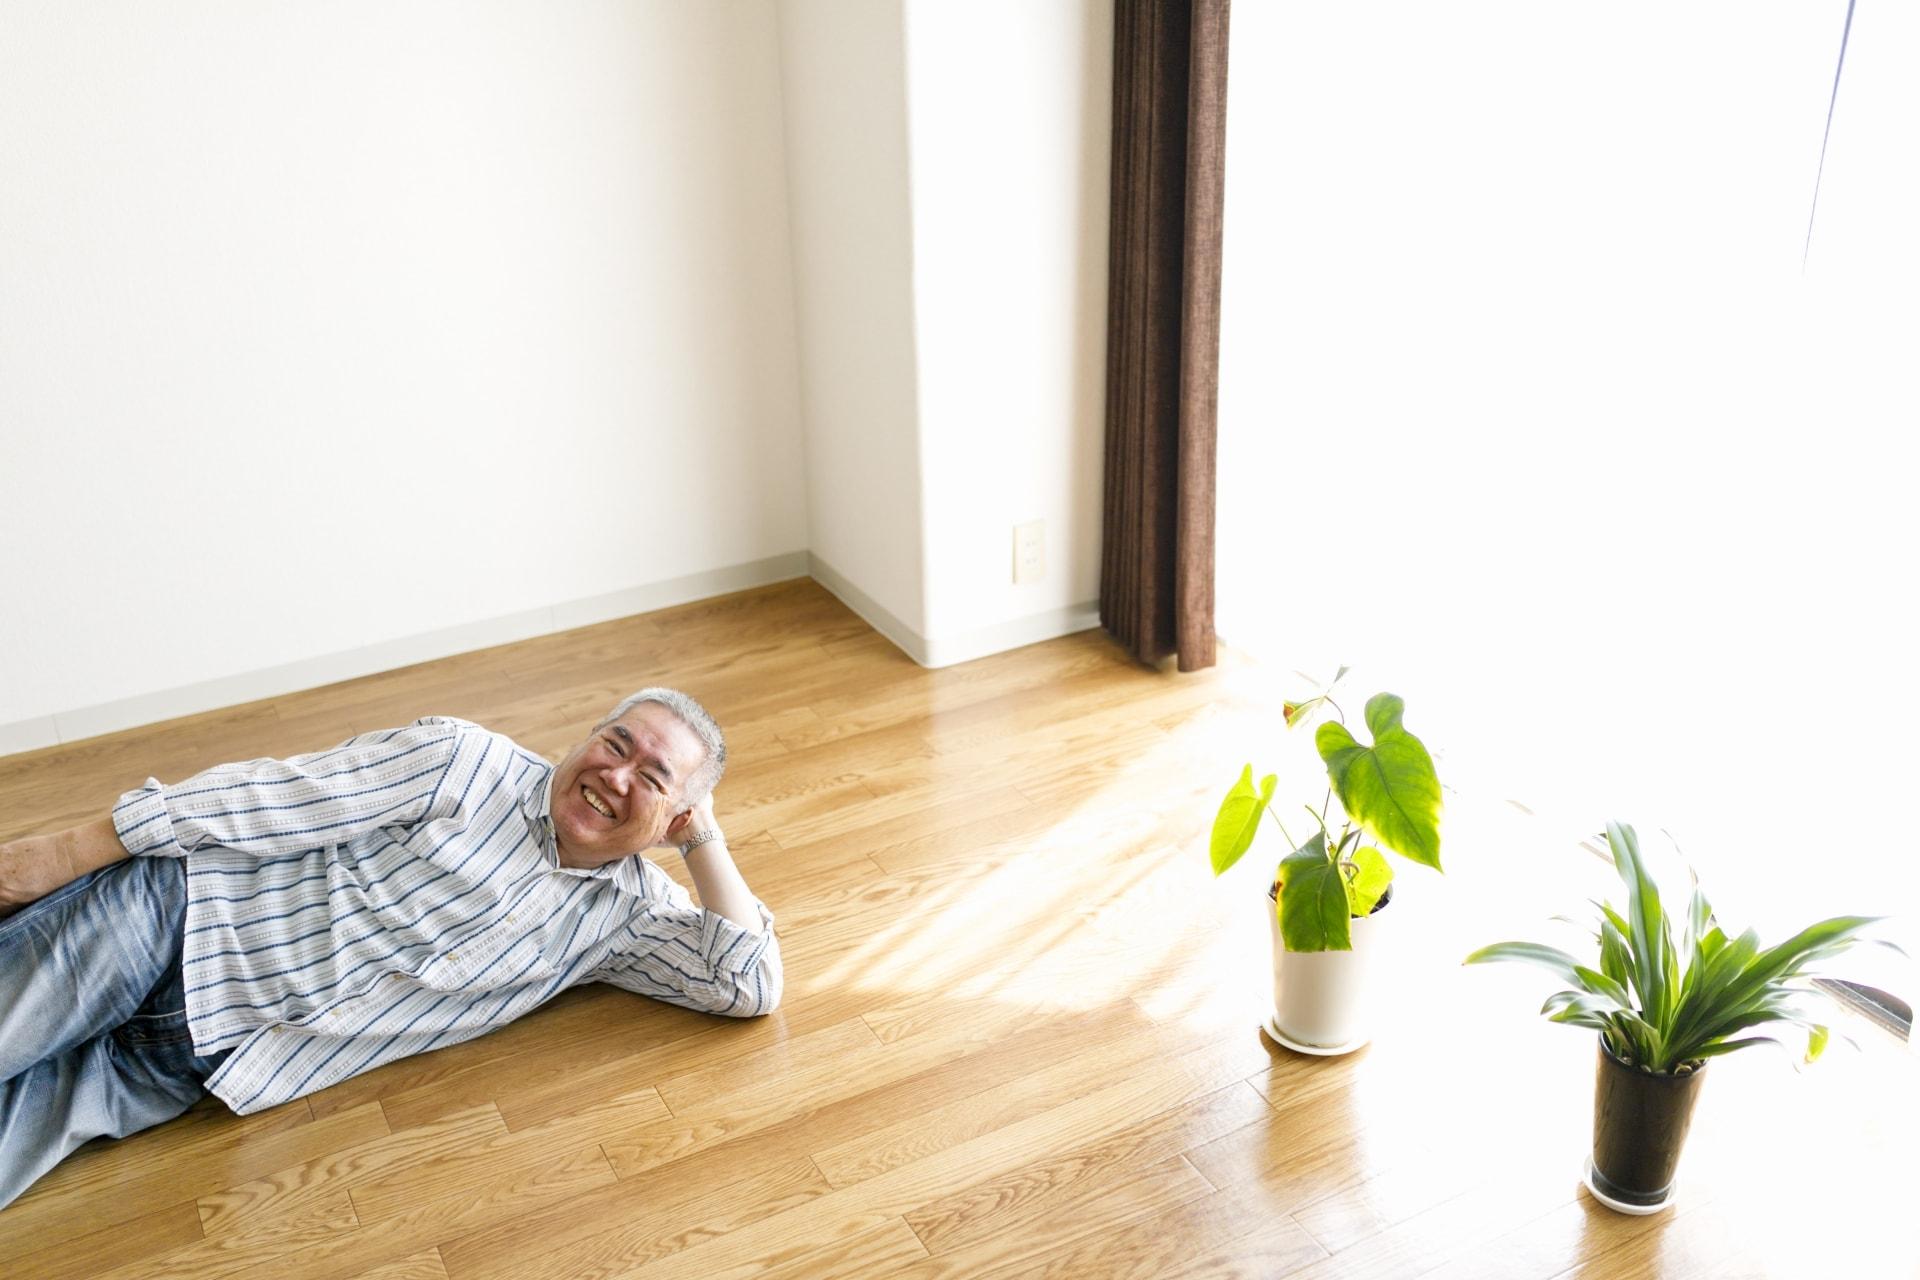 【個人年金保険】一時払個人年金保険の仕組み